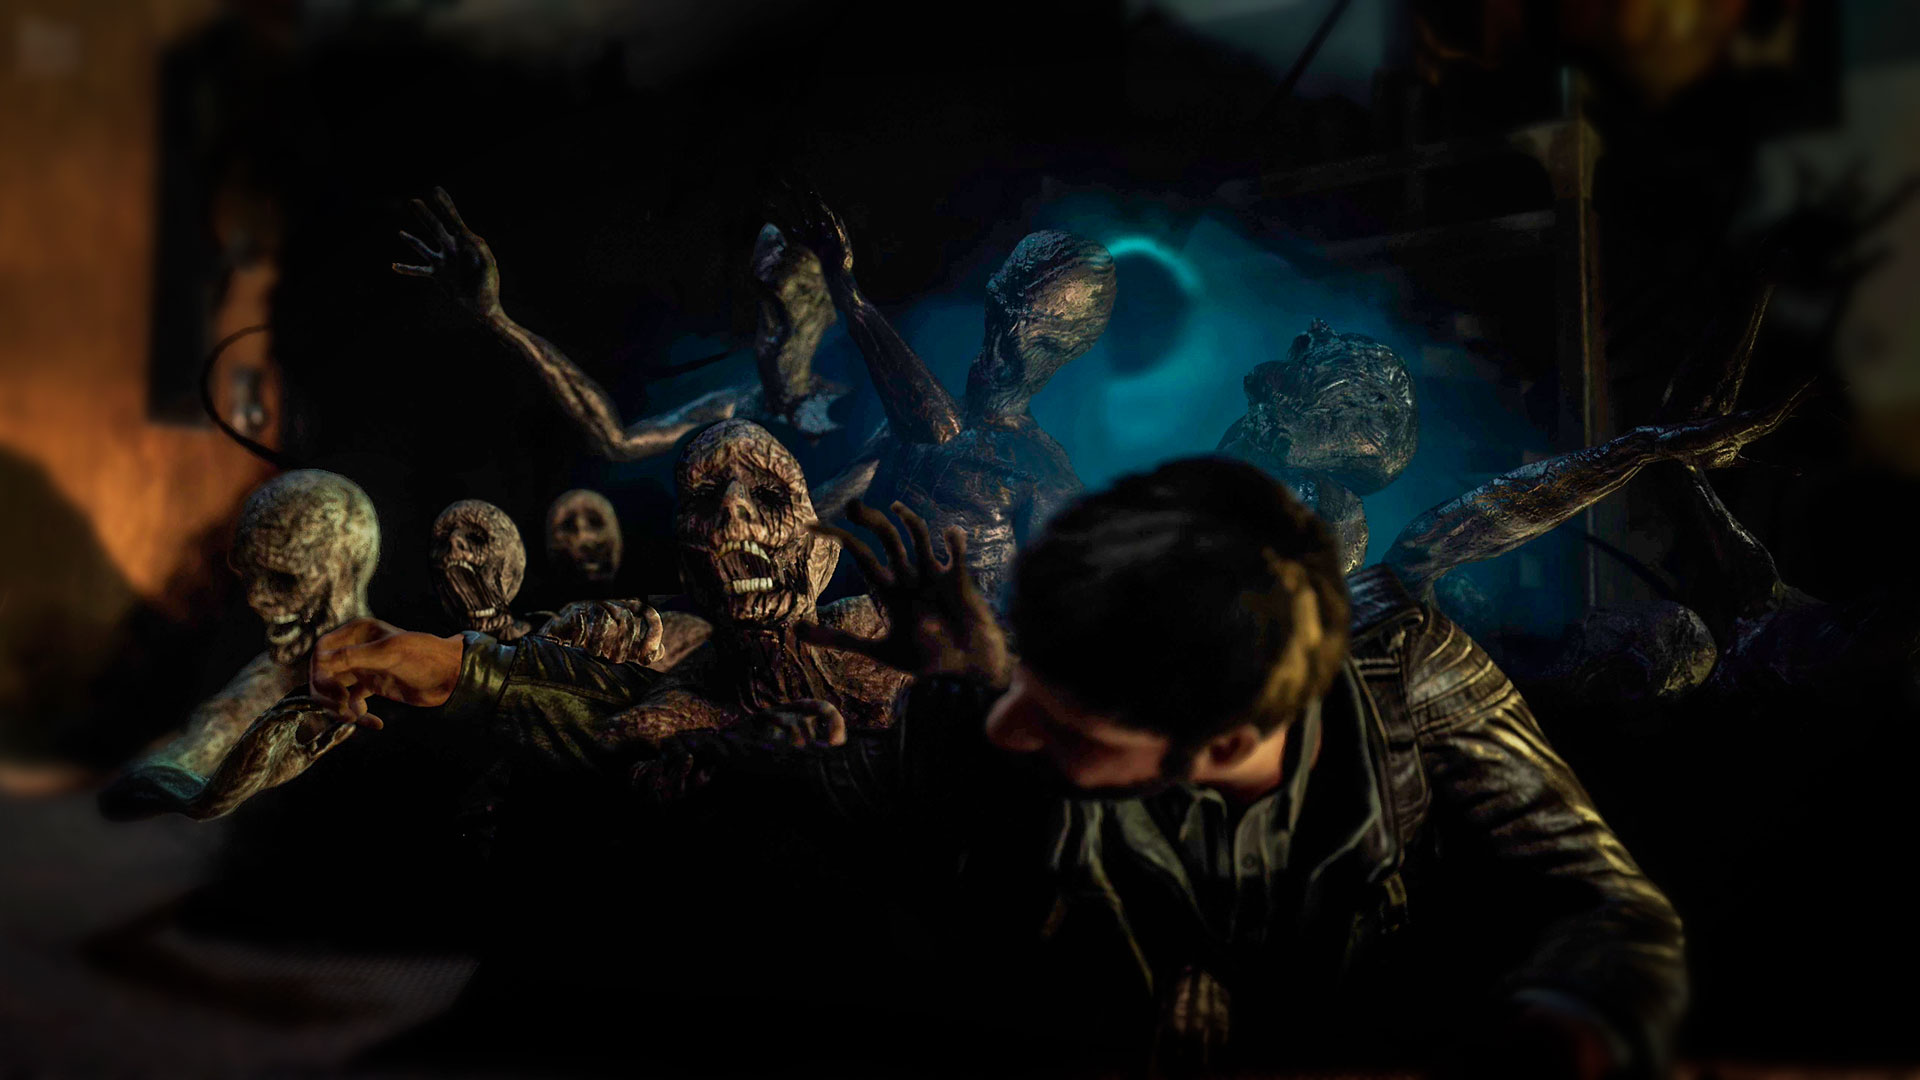 Song of Horror игра в жанре Хоррор